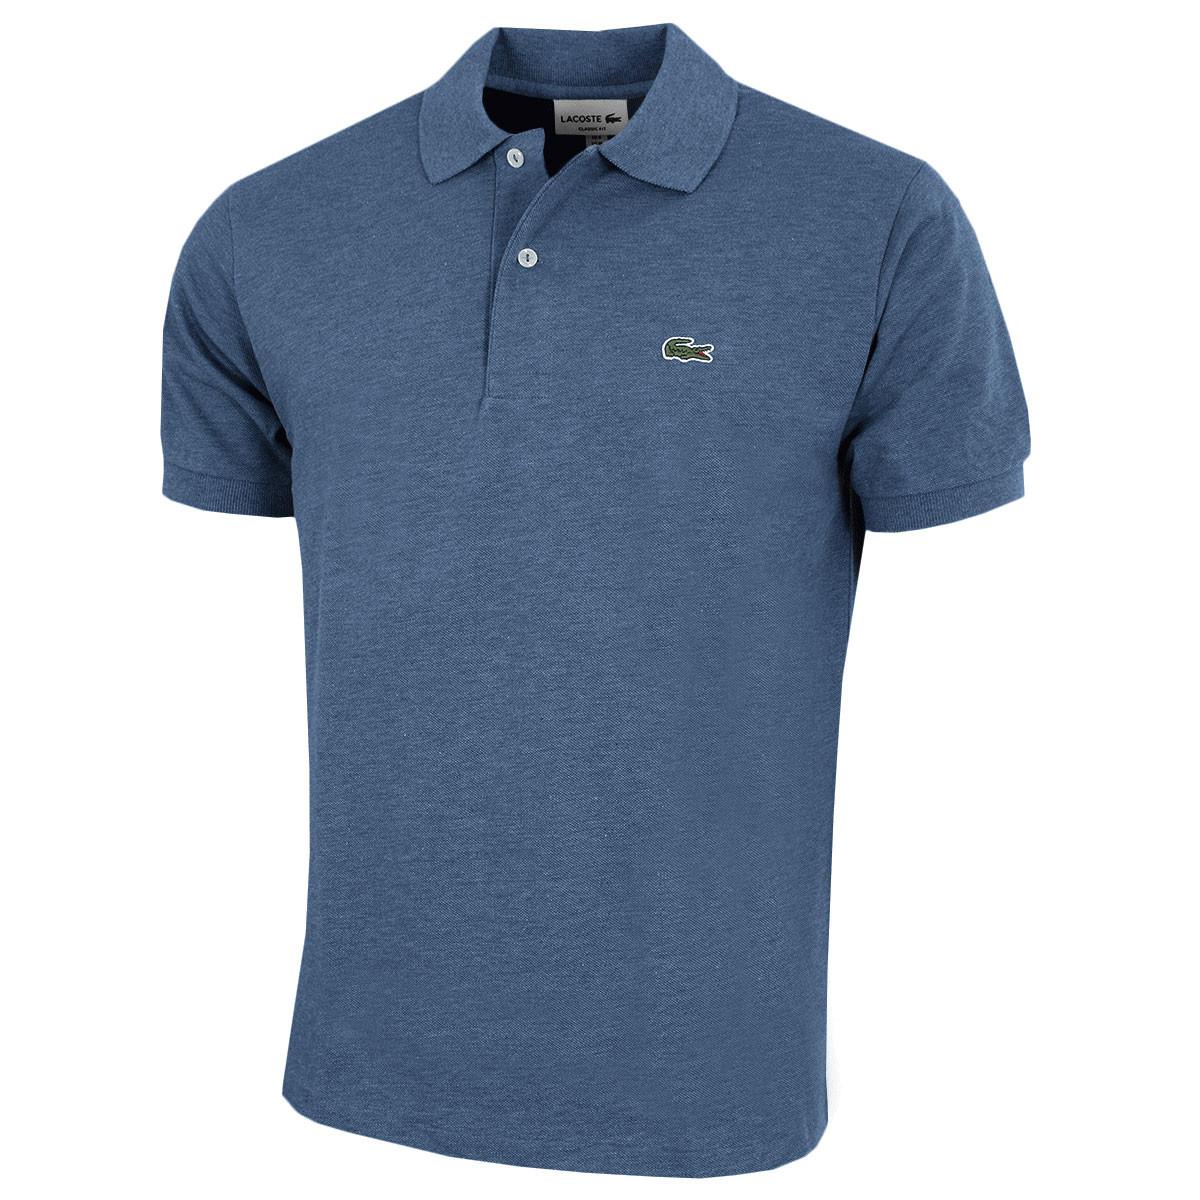 1a1cd3239 Lacoste Mens 2019 Original Mottled Polo Shirt